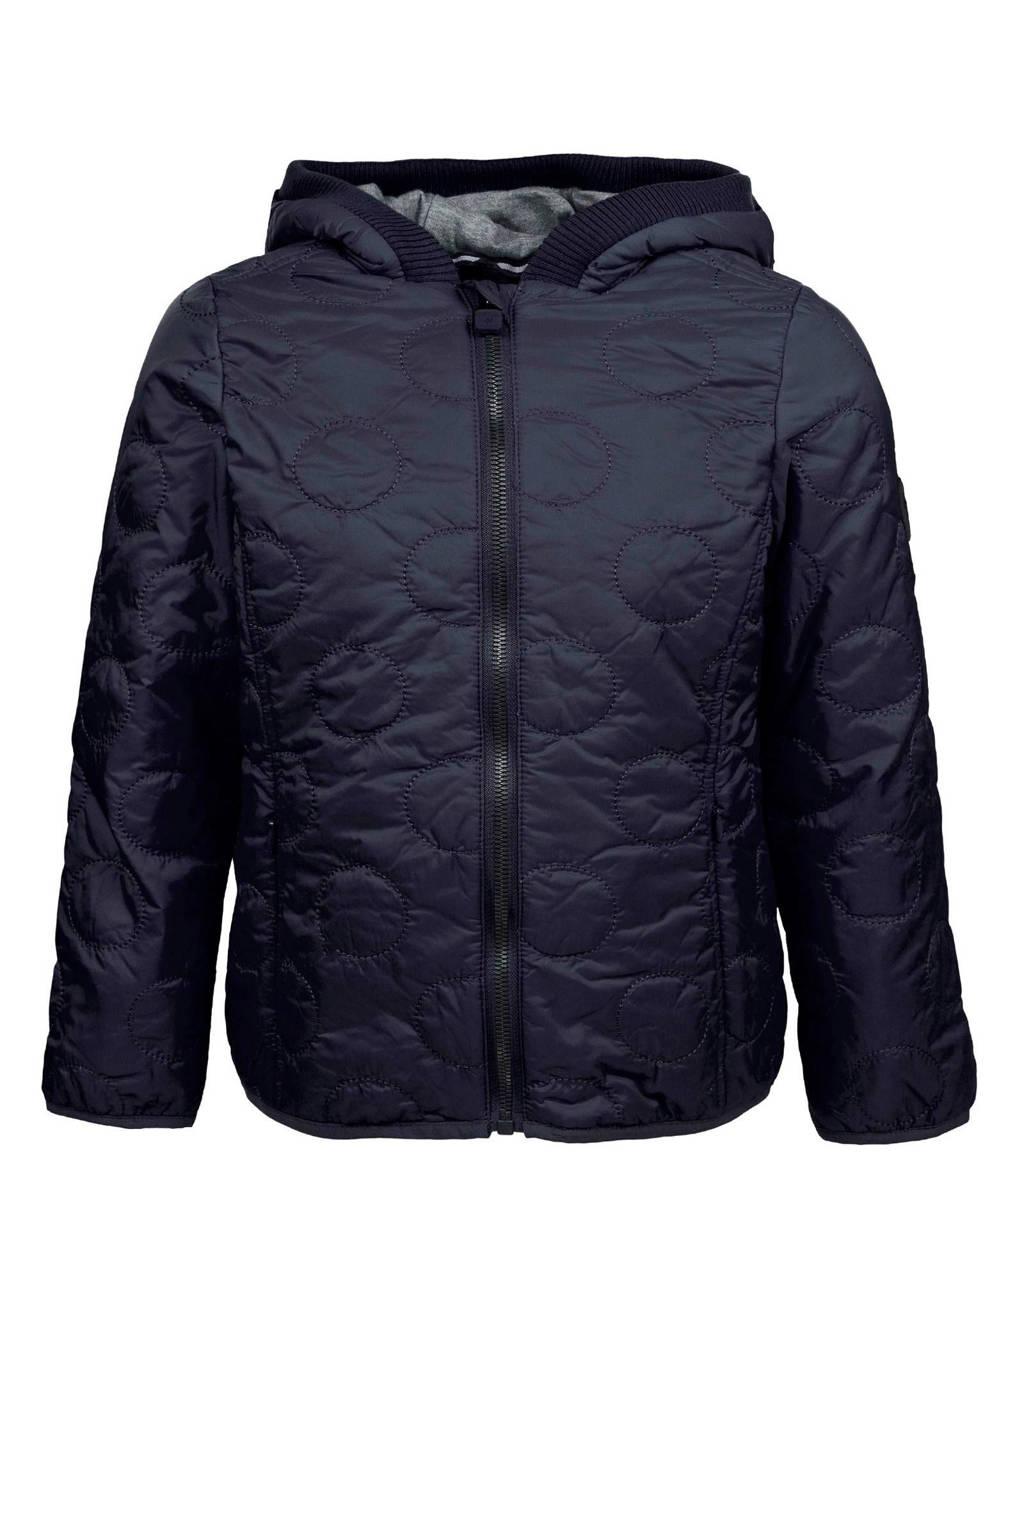 Marc O'Polo jas met gestikte rondjes blauw, Donkerblauw